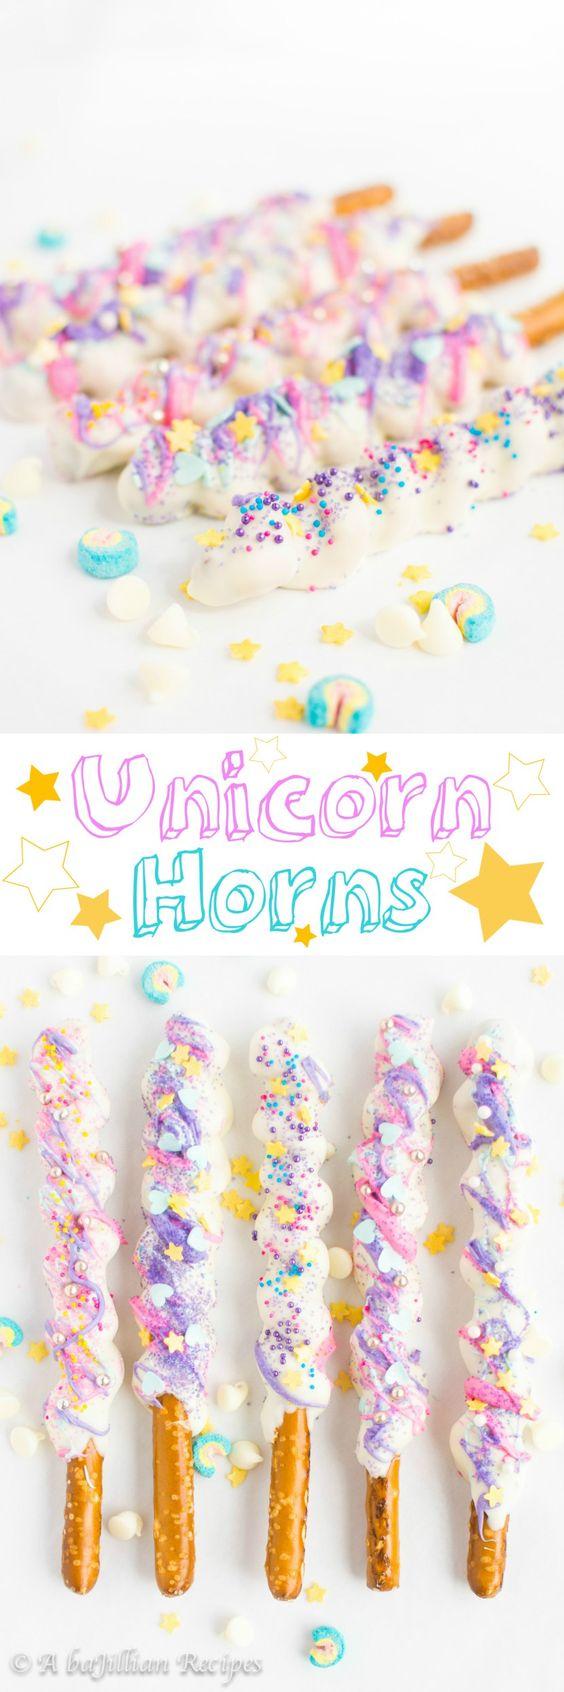 Unicorn desserts for a unicorn party: Unicorn Horns